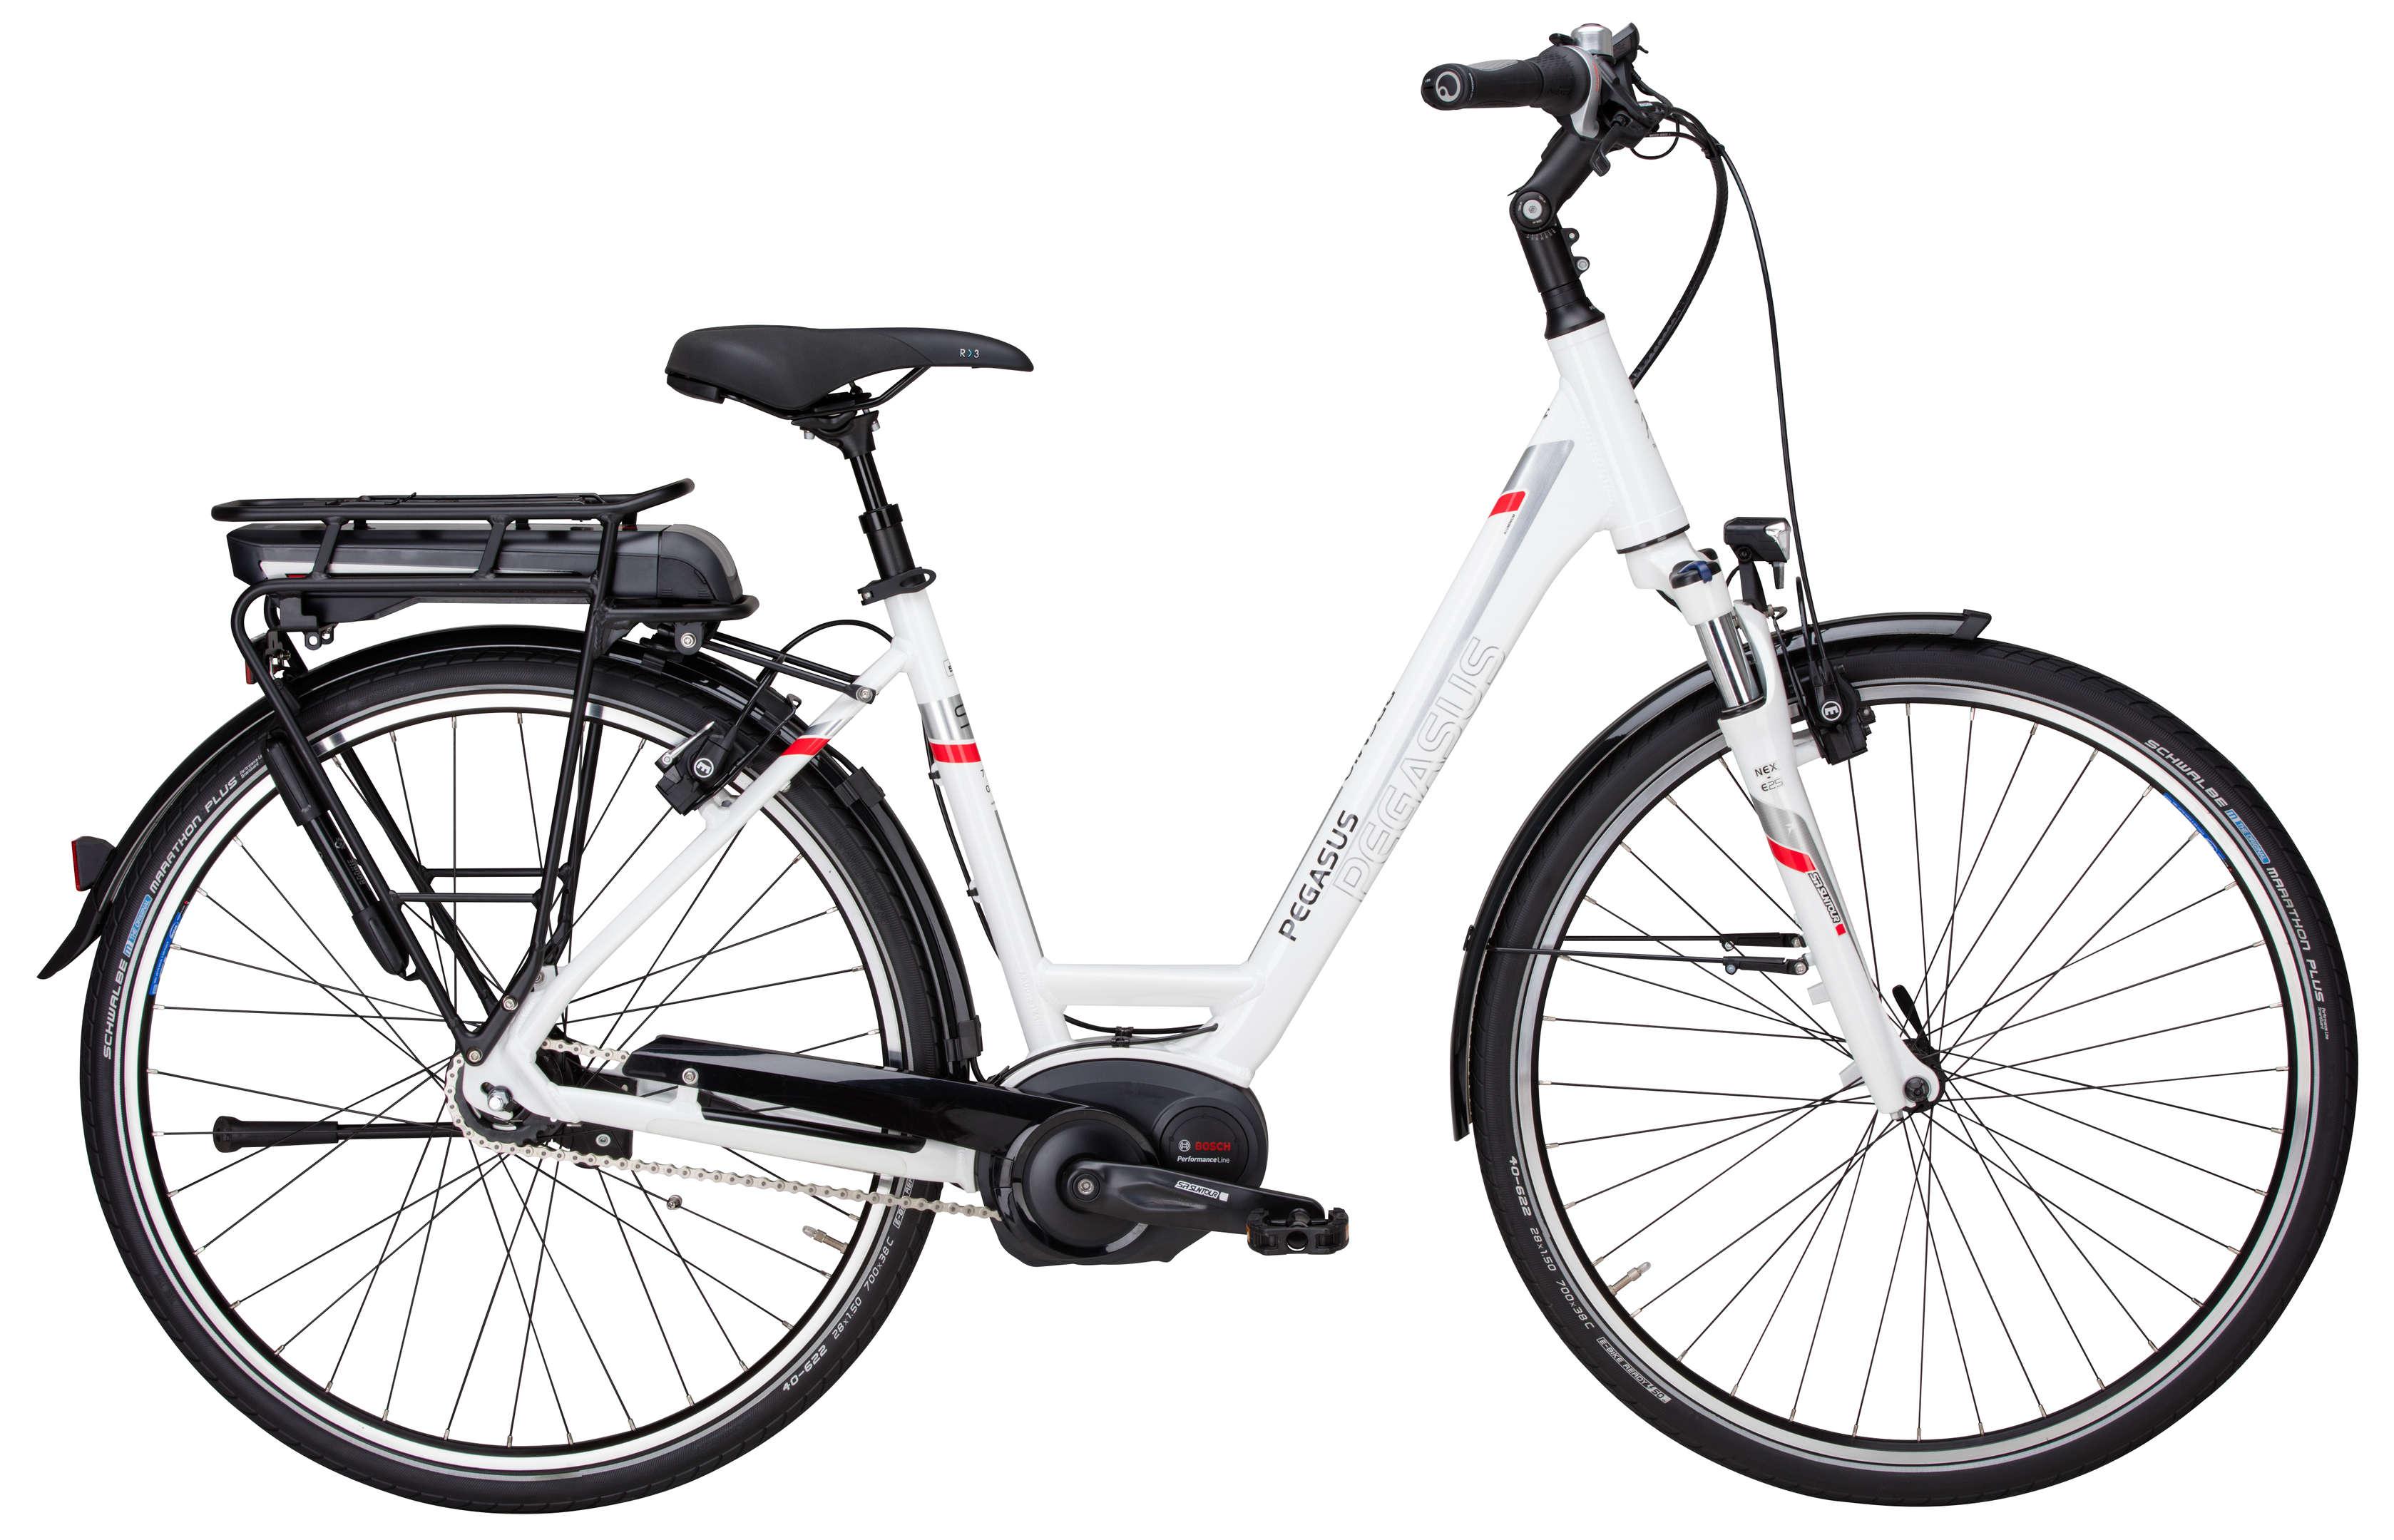 pegasus e bike premio e8f eurorad bikeleasingeurorad. Black Bedroom Furniture Sets. Home Design Ideas